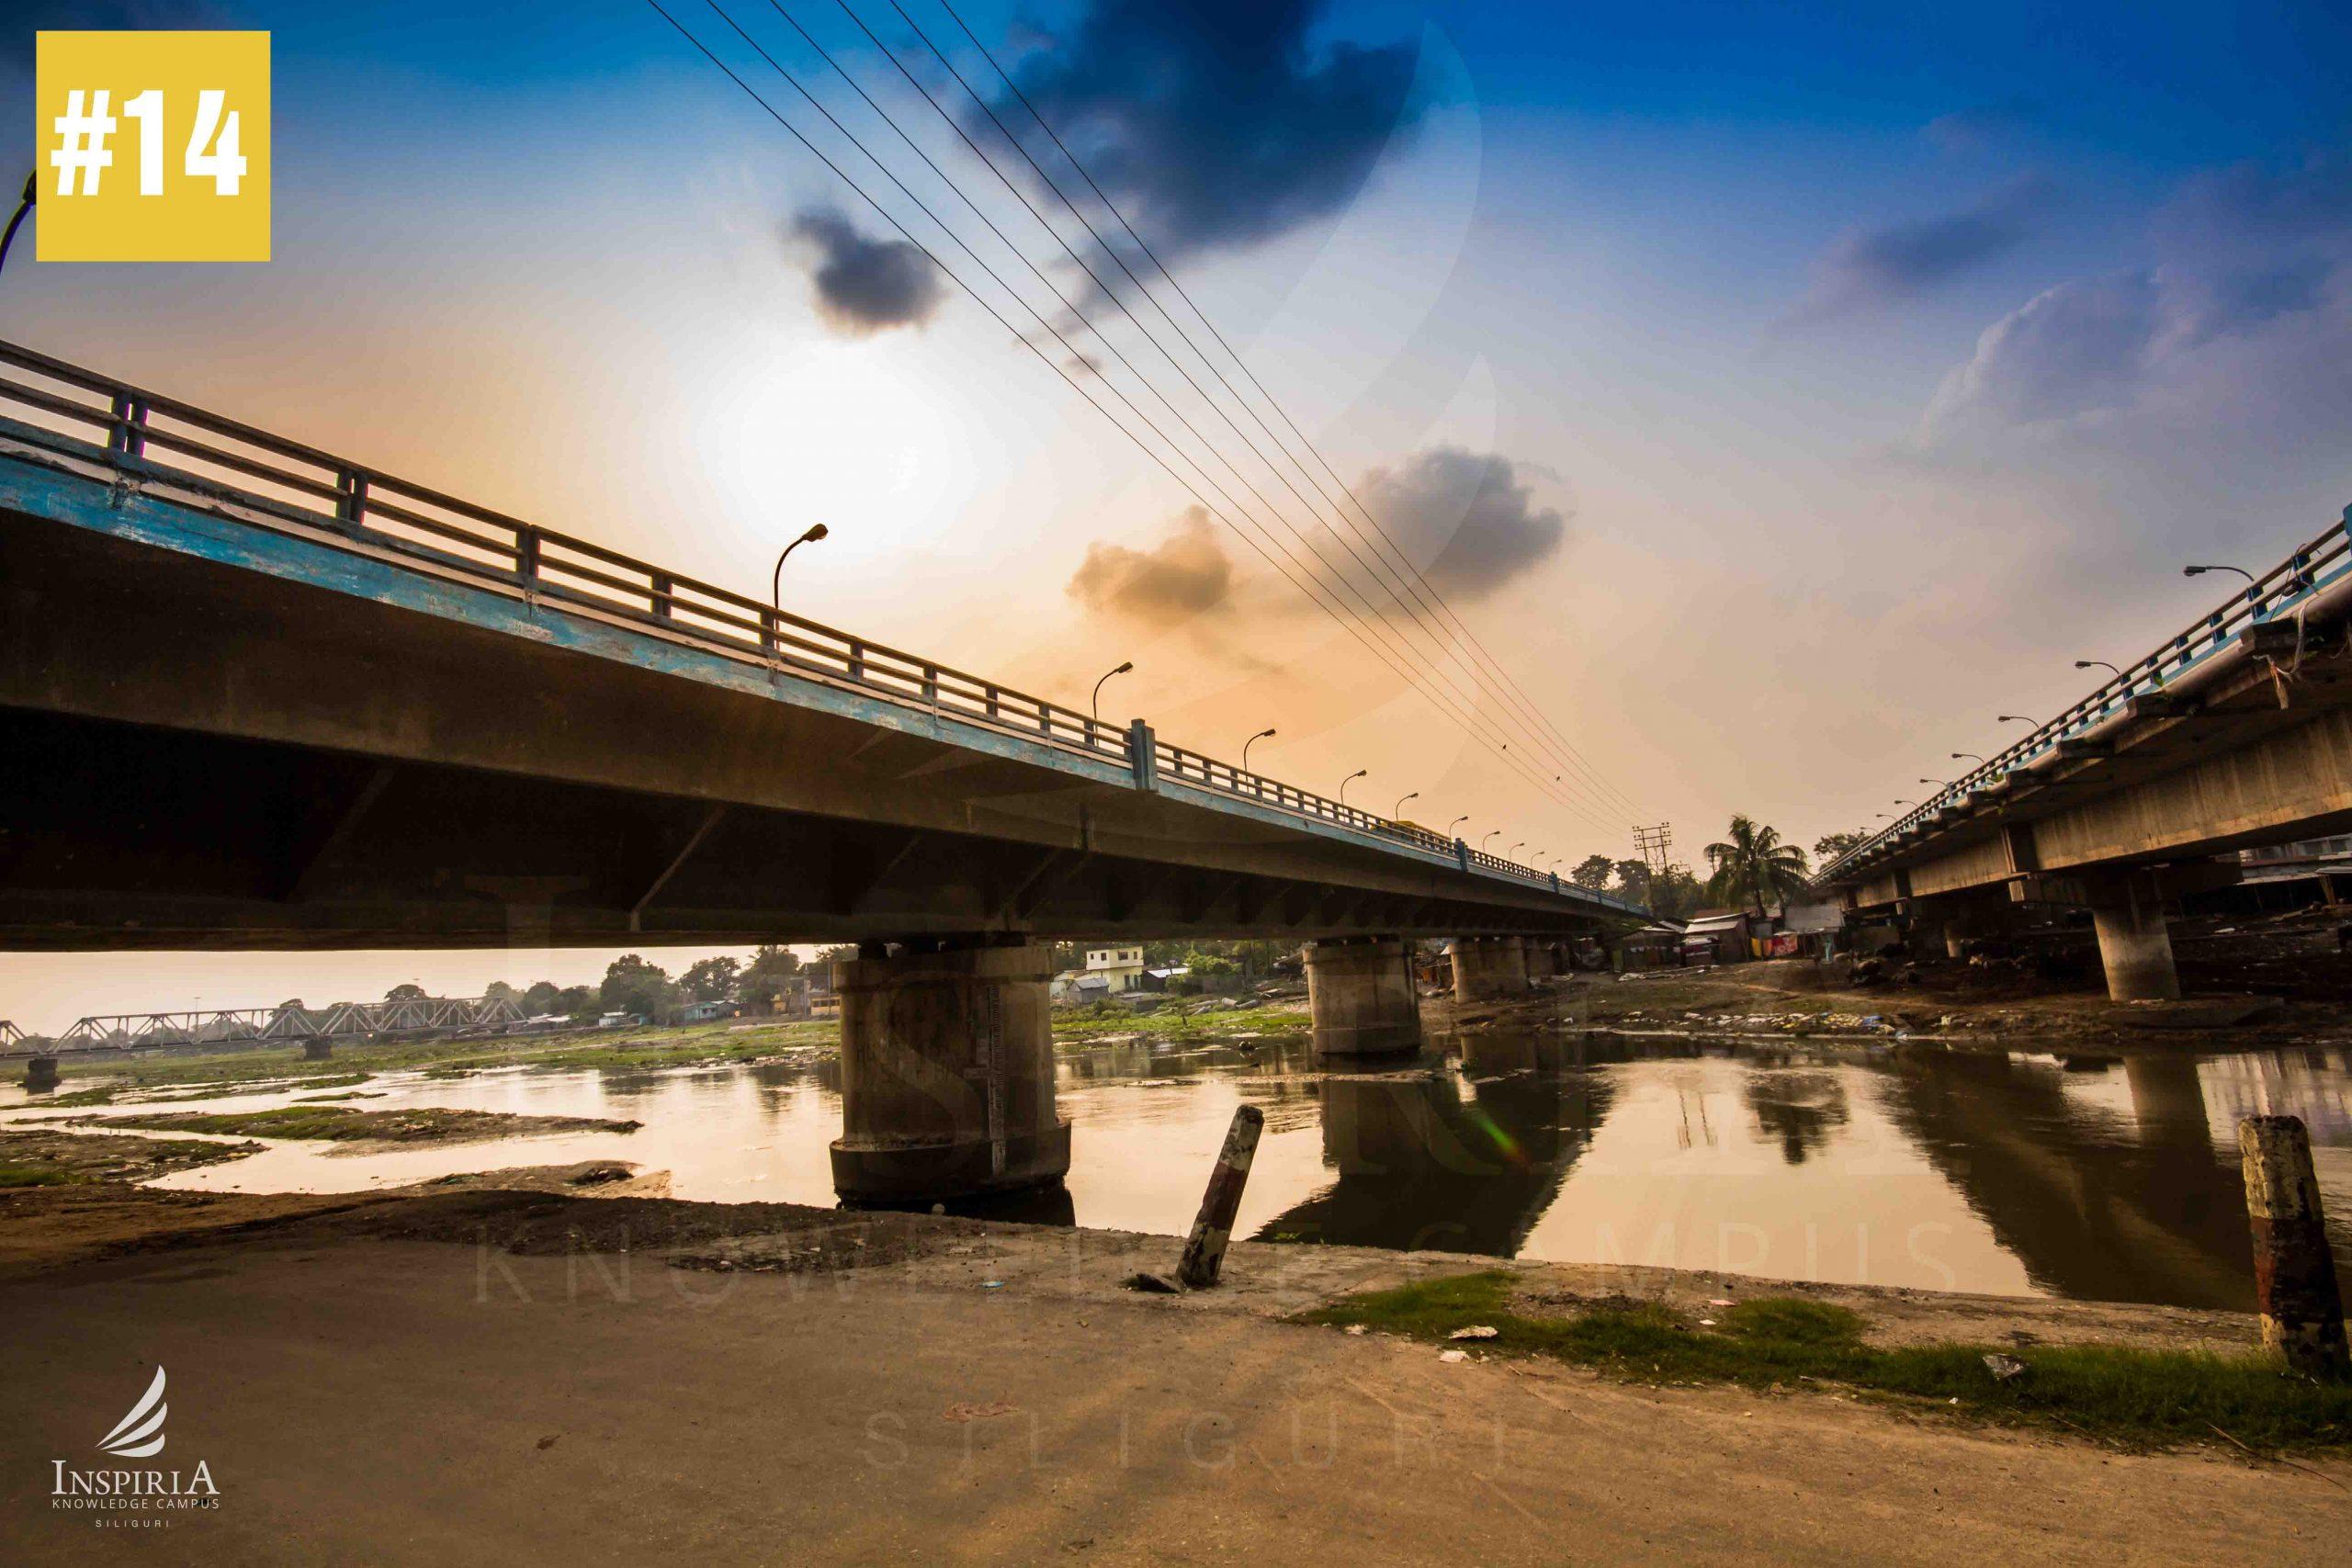 mahananda-bridge-middle-view-siliguri